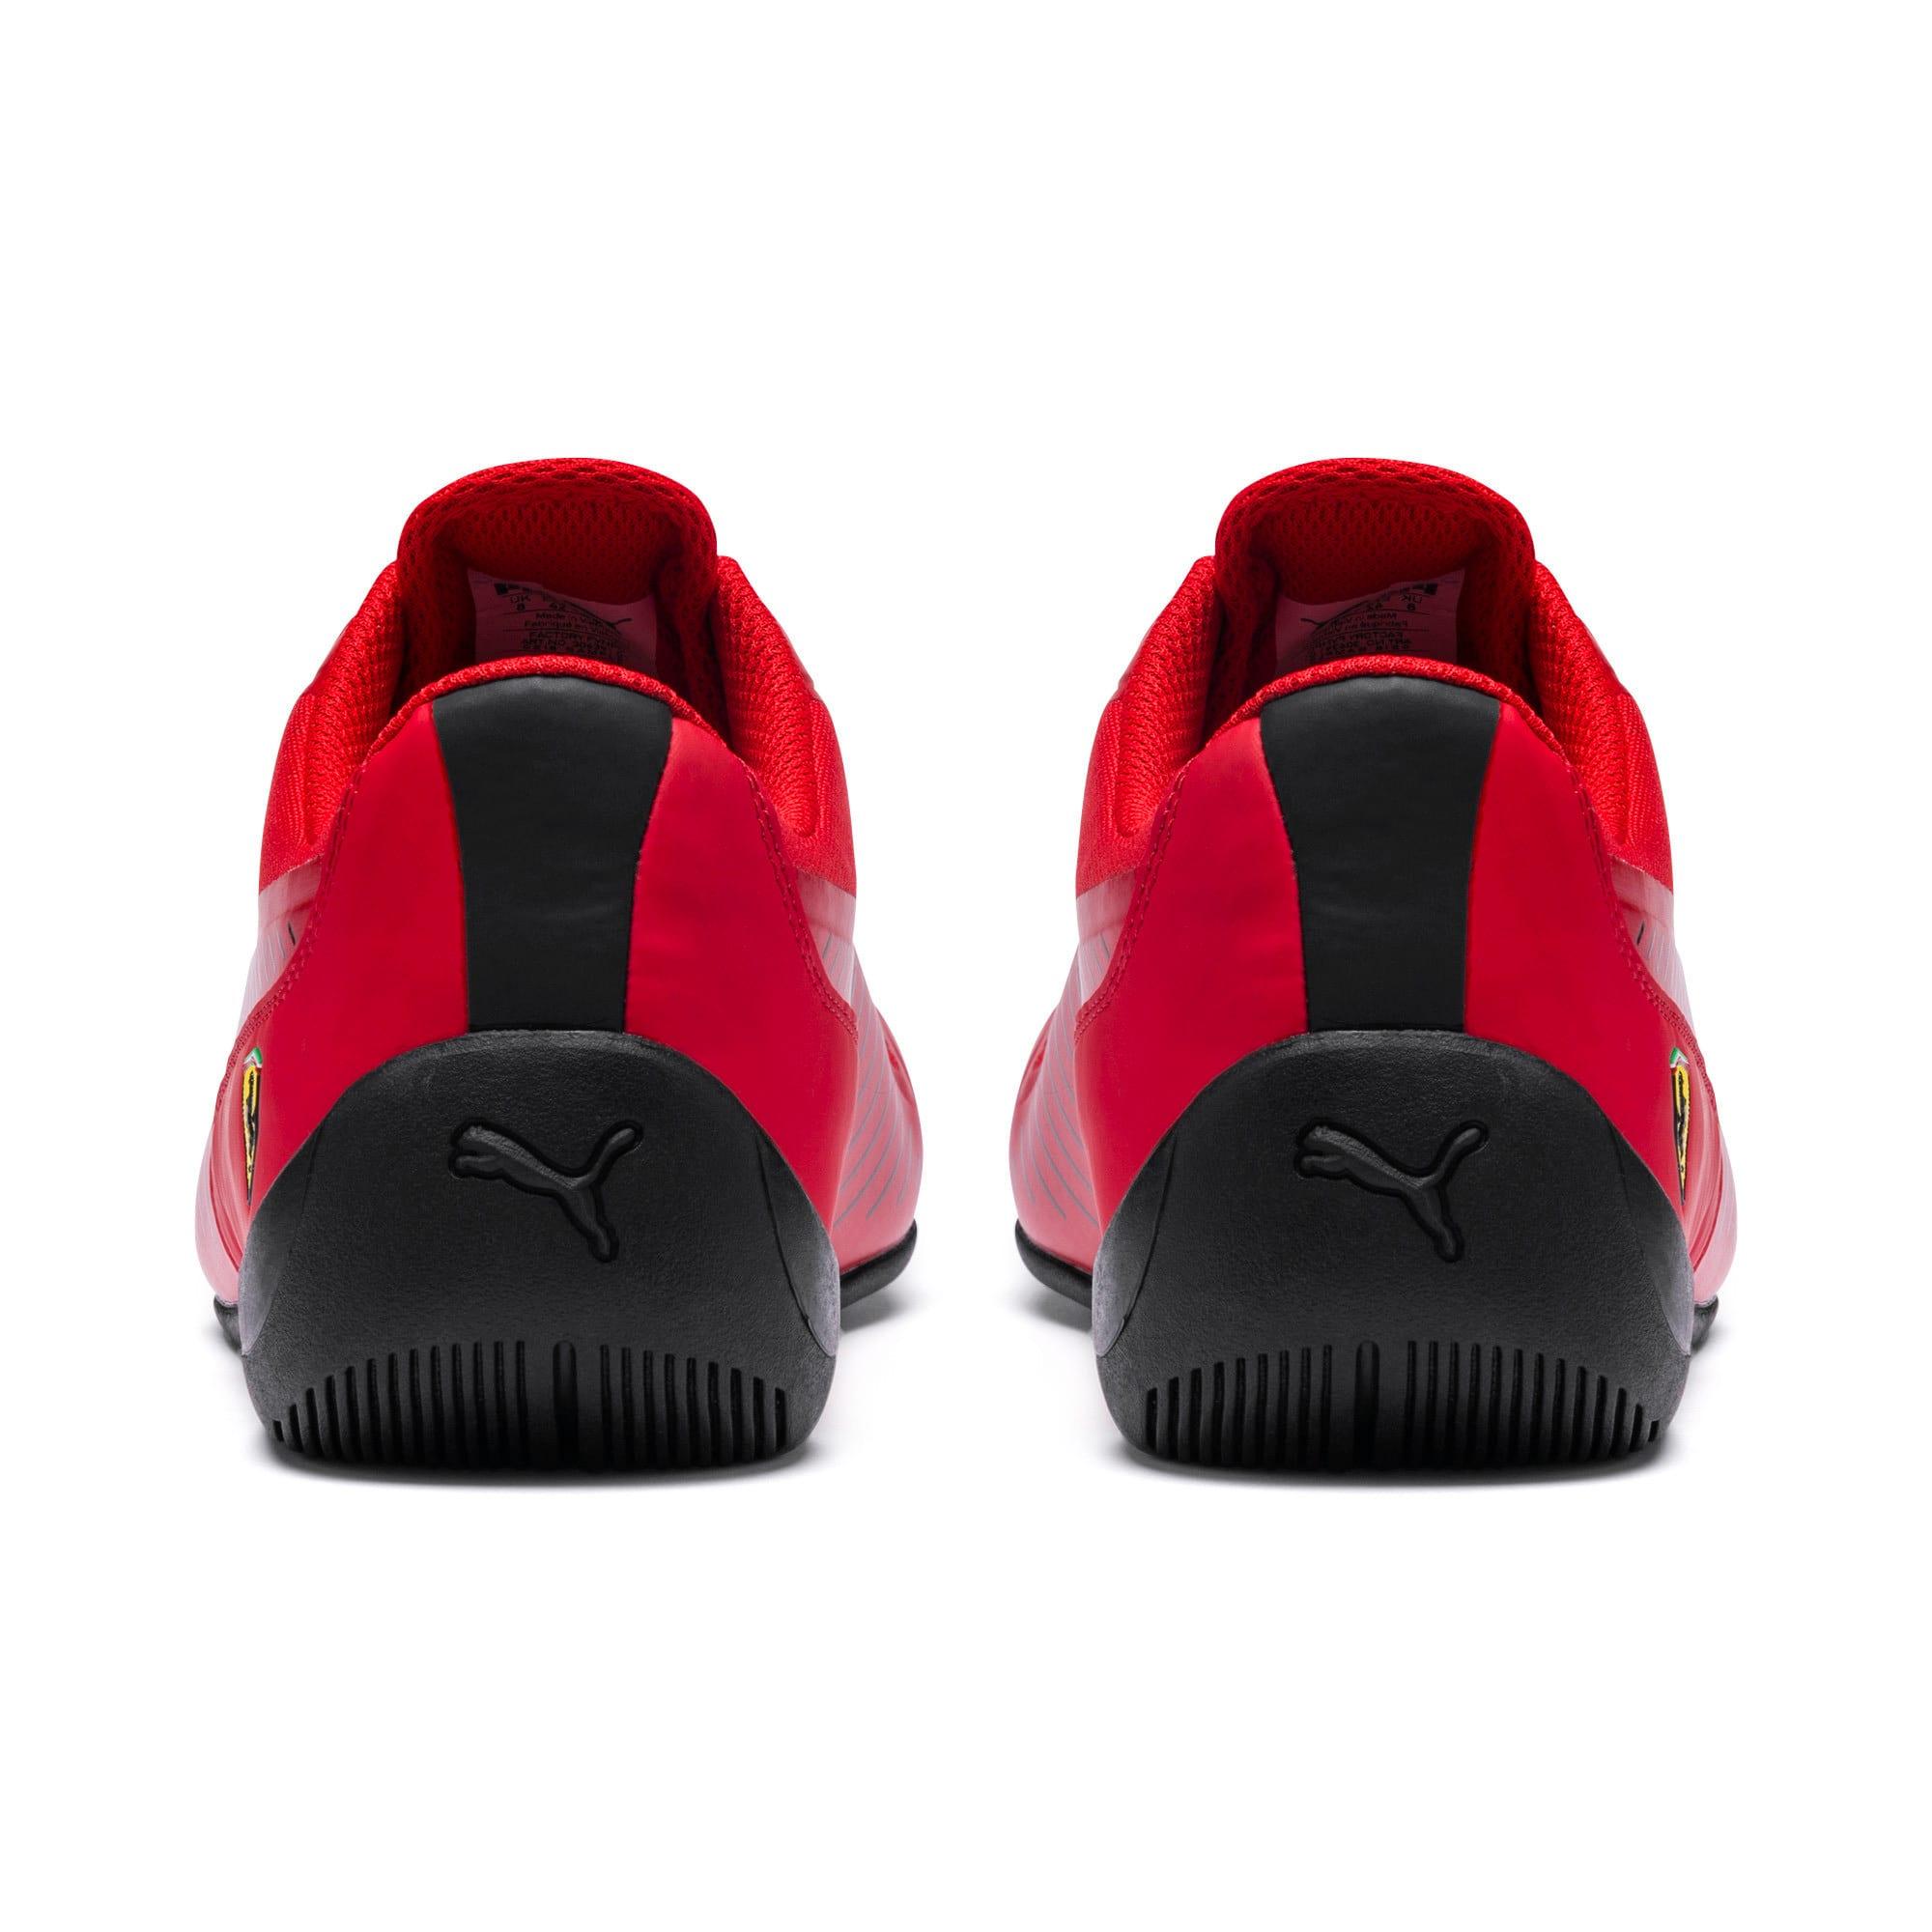 Thumbnail 3 of Scuderia Ferrari Drift Cat 7 Ultra Shoes, Rosso Corsa-Puma Black, medium